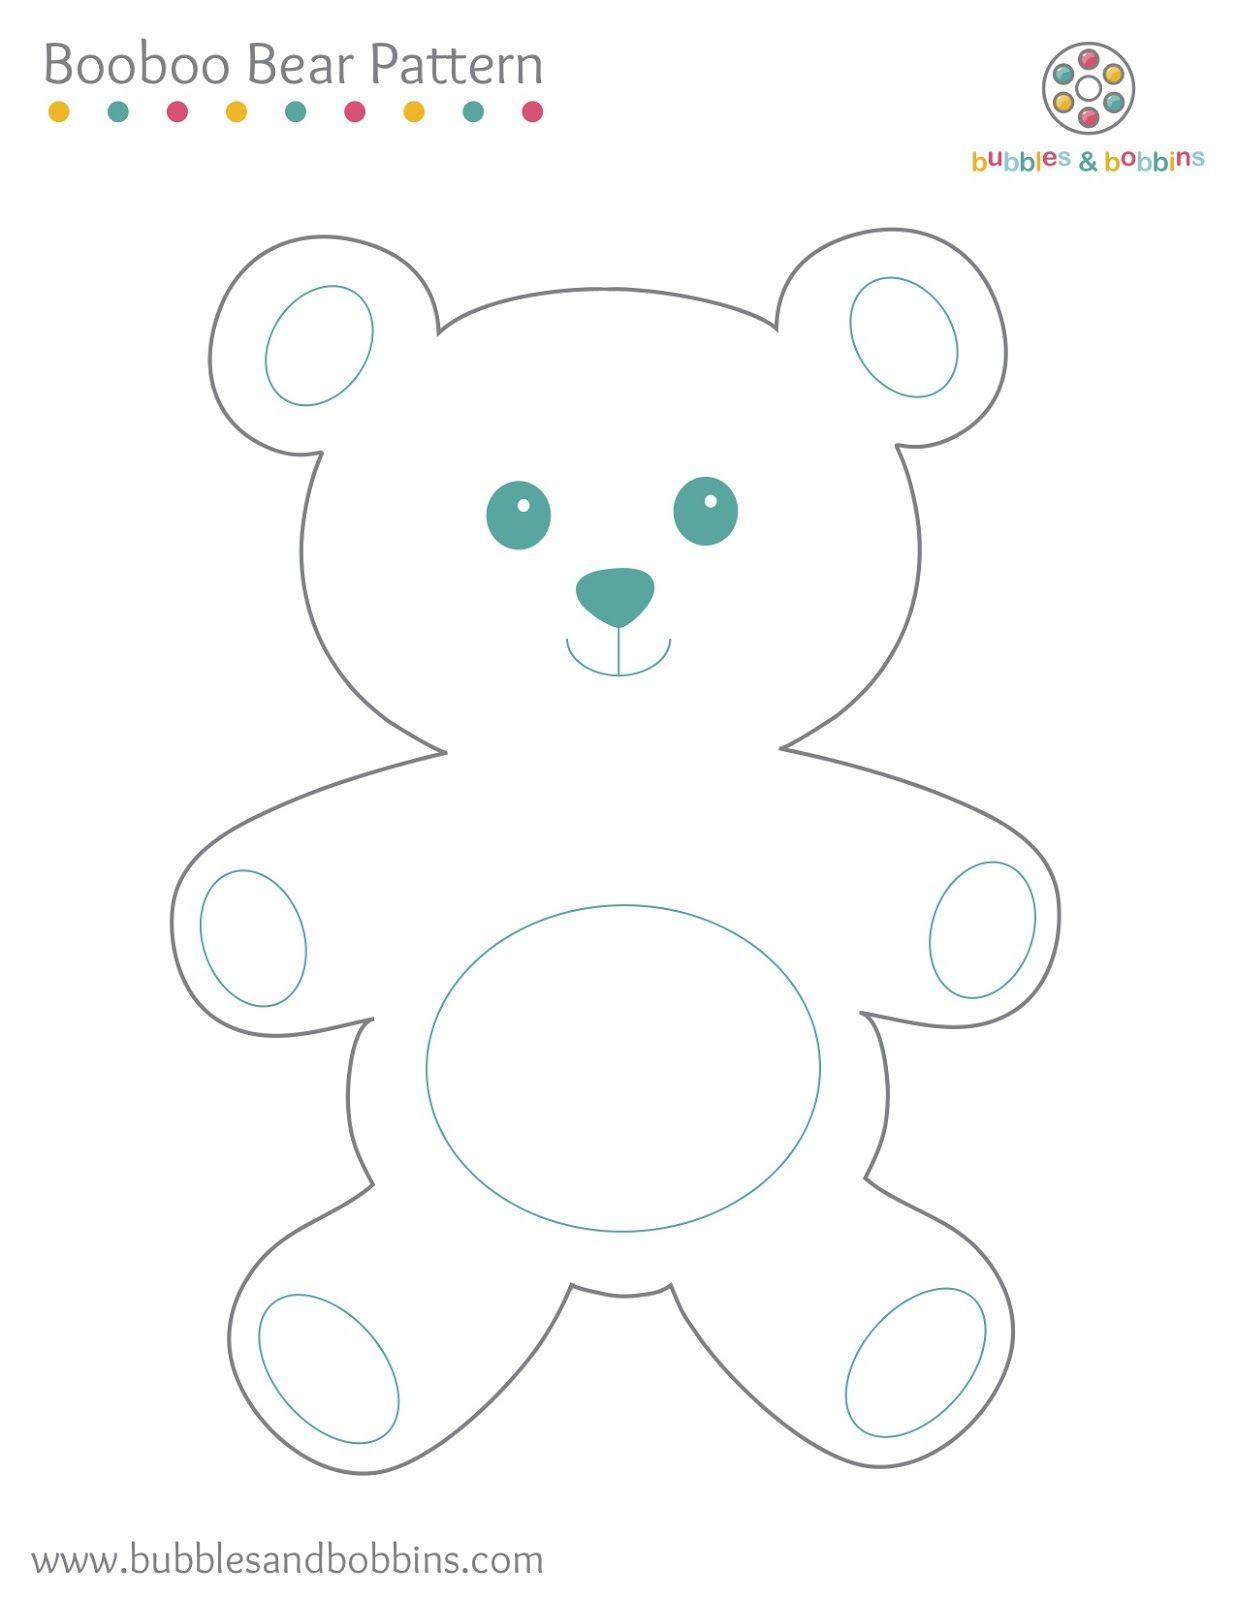 Booboo bear pattern | Stuffed Toy Patterns & Ideas | Pinterest ...